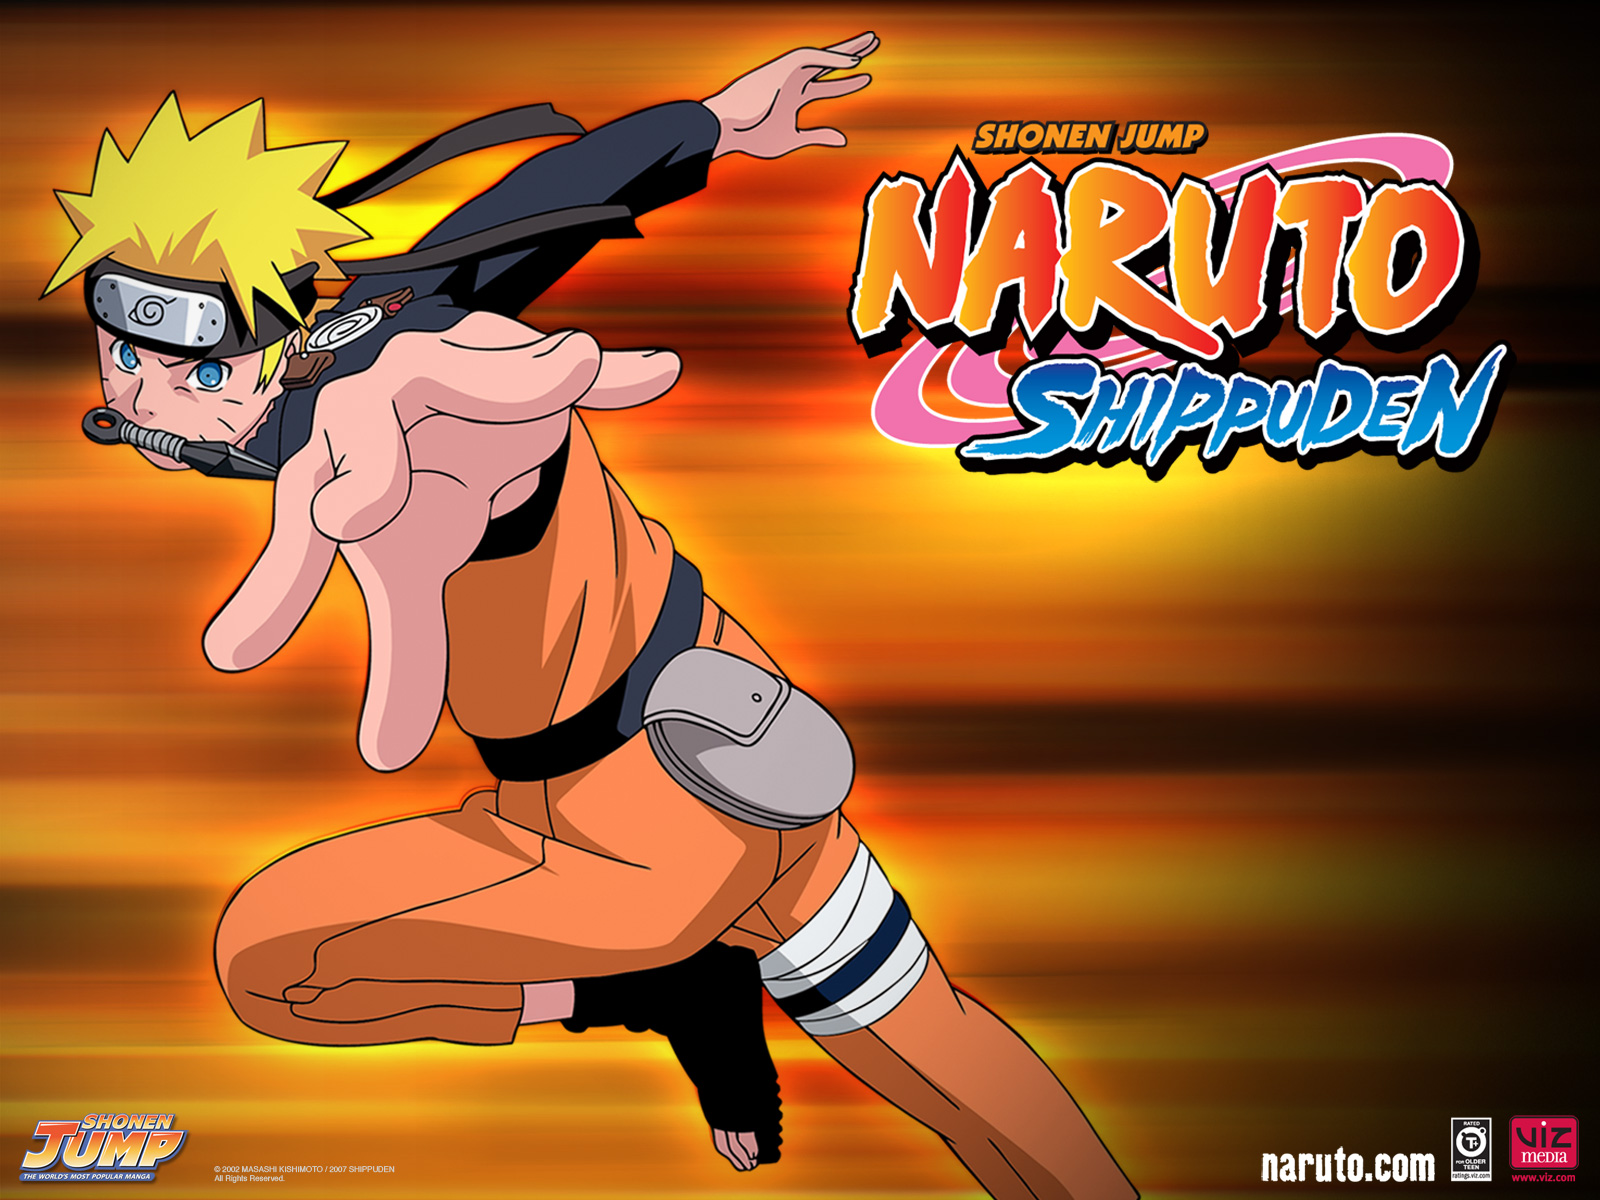 Naruto Shippuden Episodes List Free Download